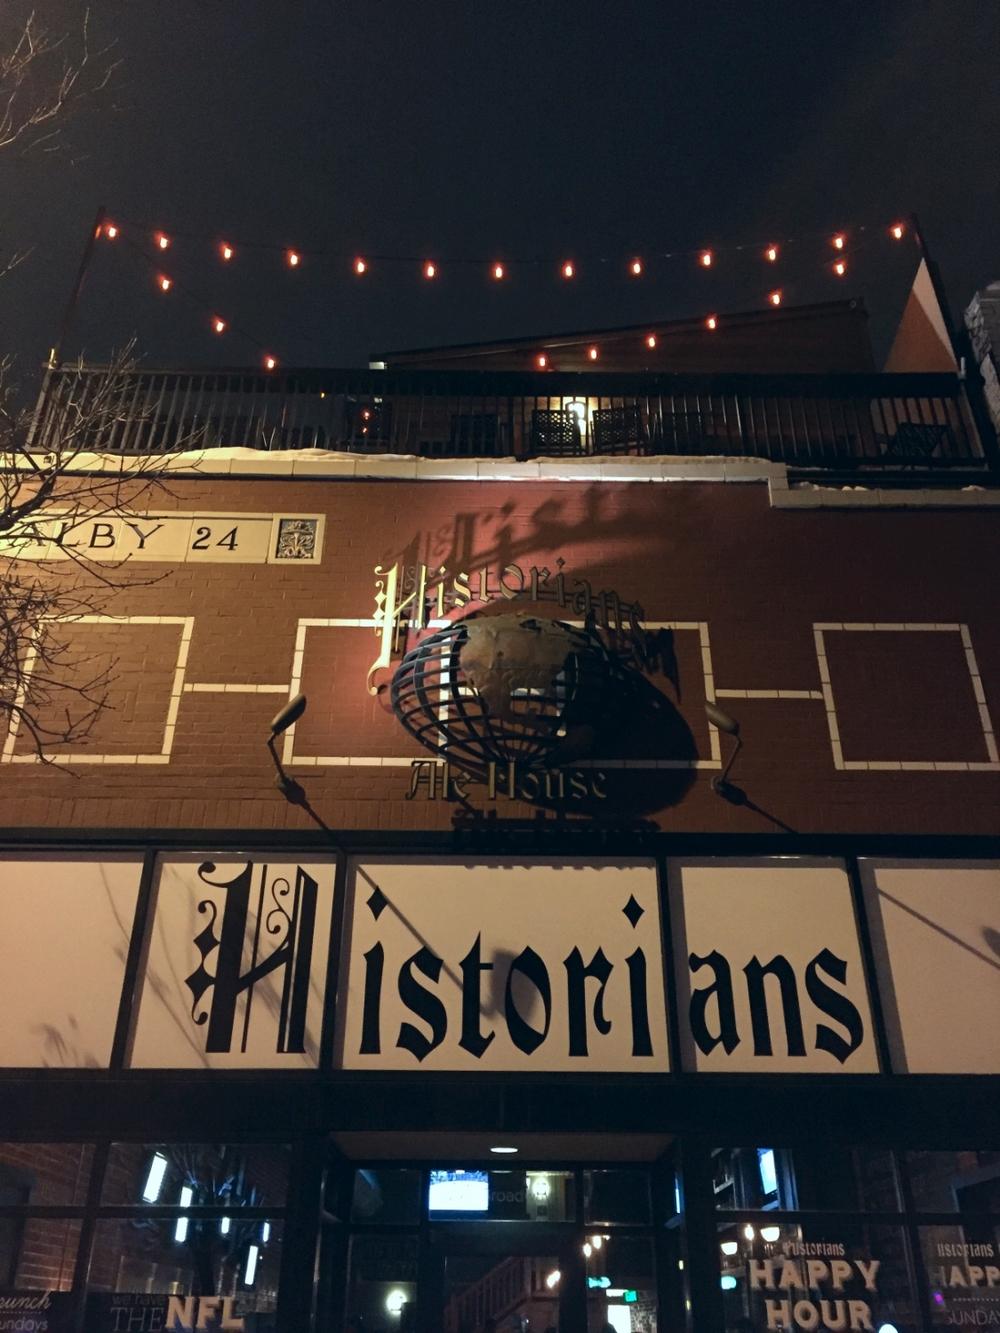 Historian Ale House, Denver, Colorado